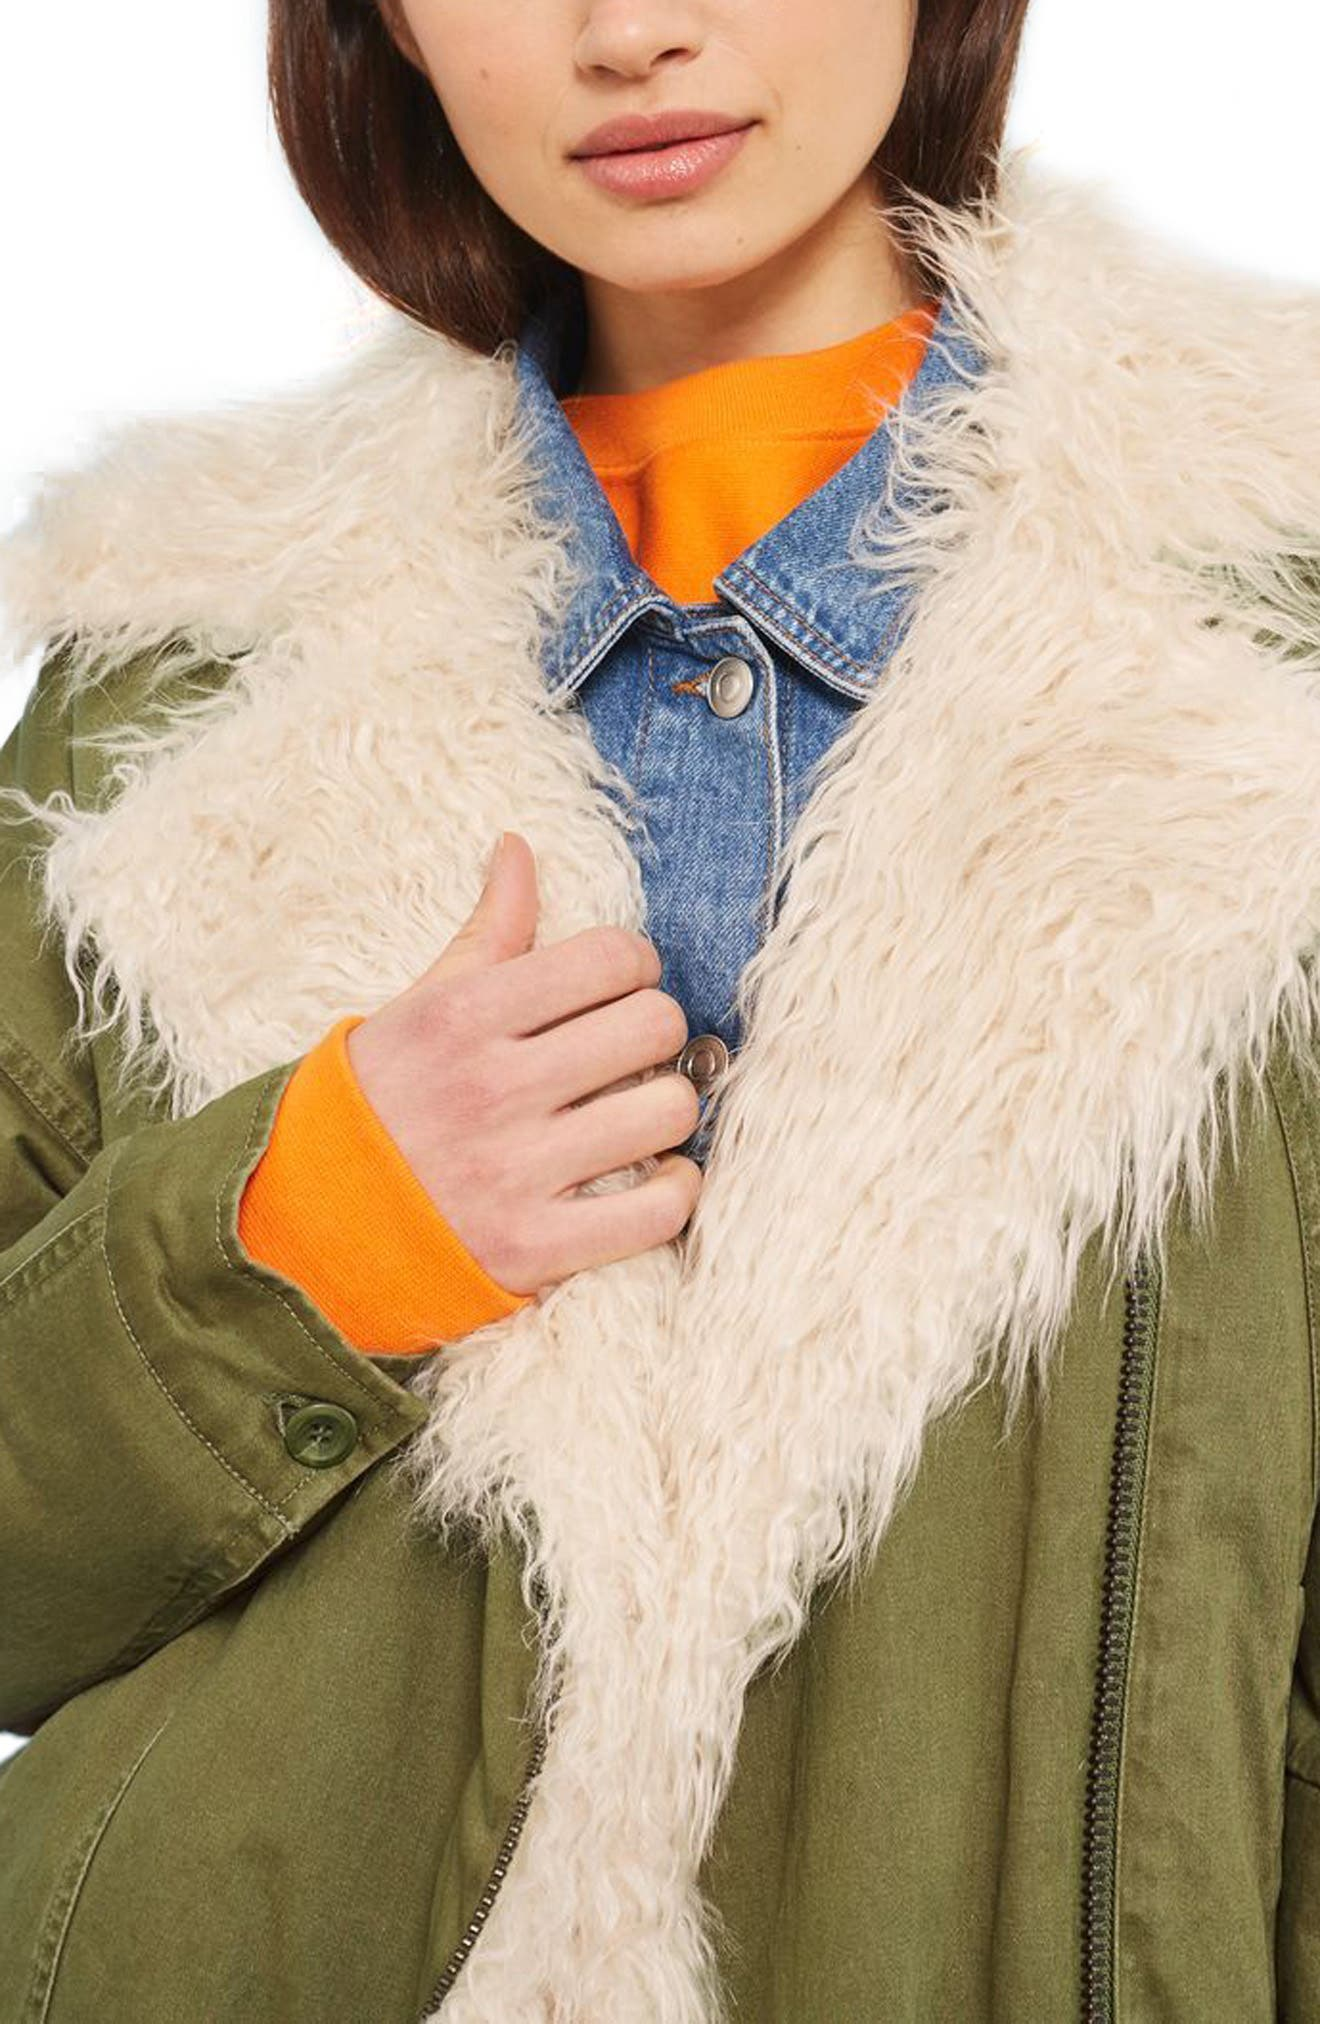 Jake Faux Fur Lined Jacket,                         Main,                         color,